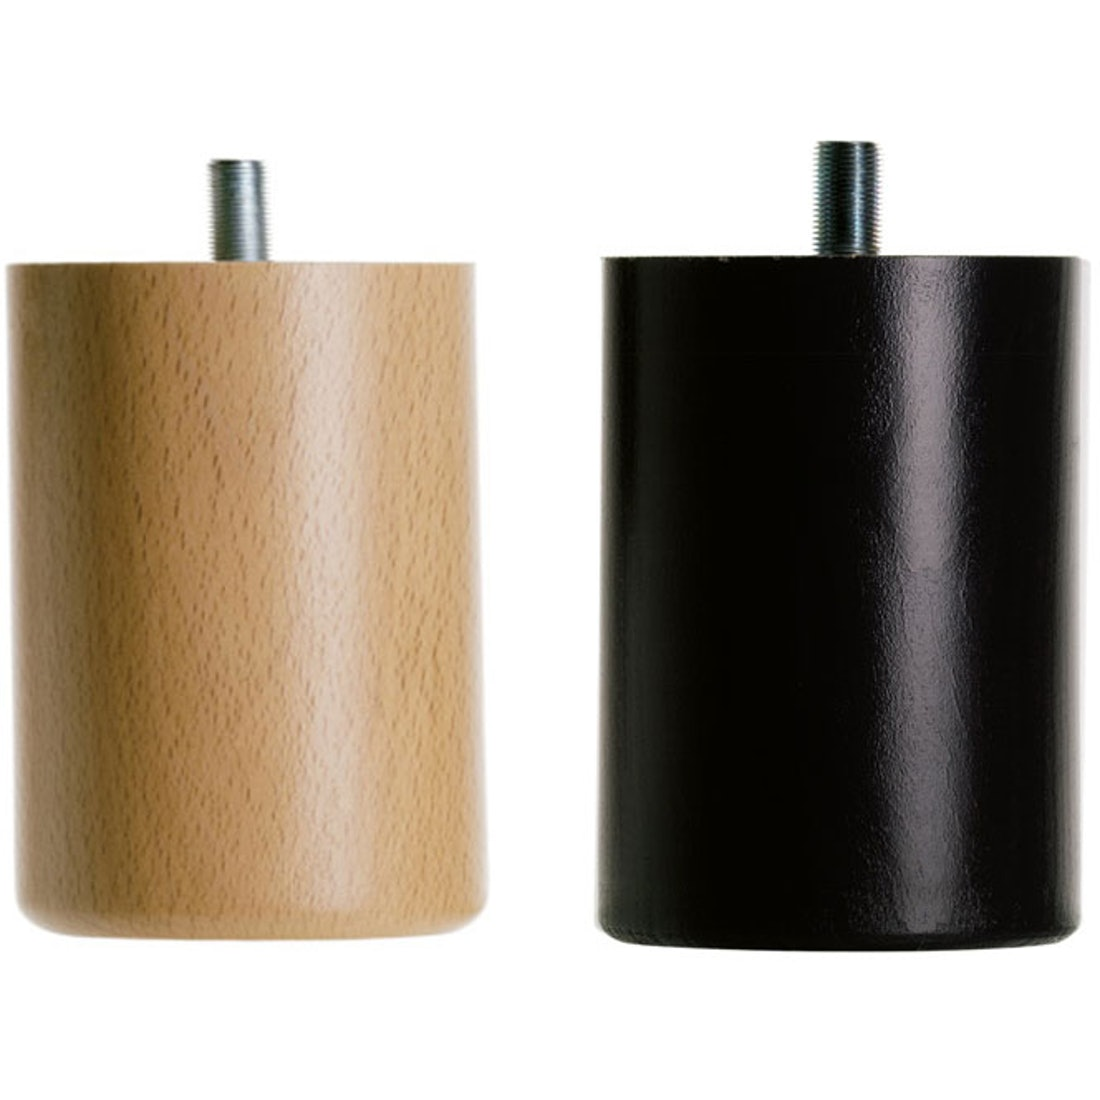 DUX Senge DUX sengeben - Rund / Ø10 cm (2-pak), Timm Møbler